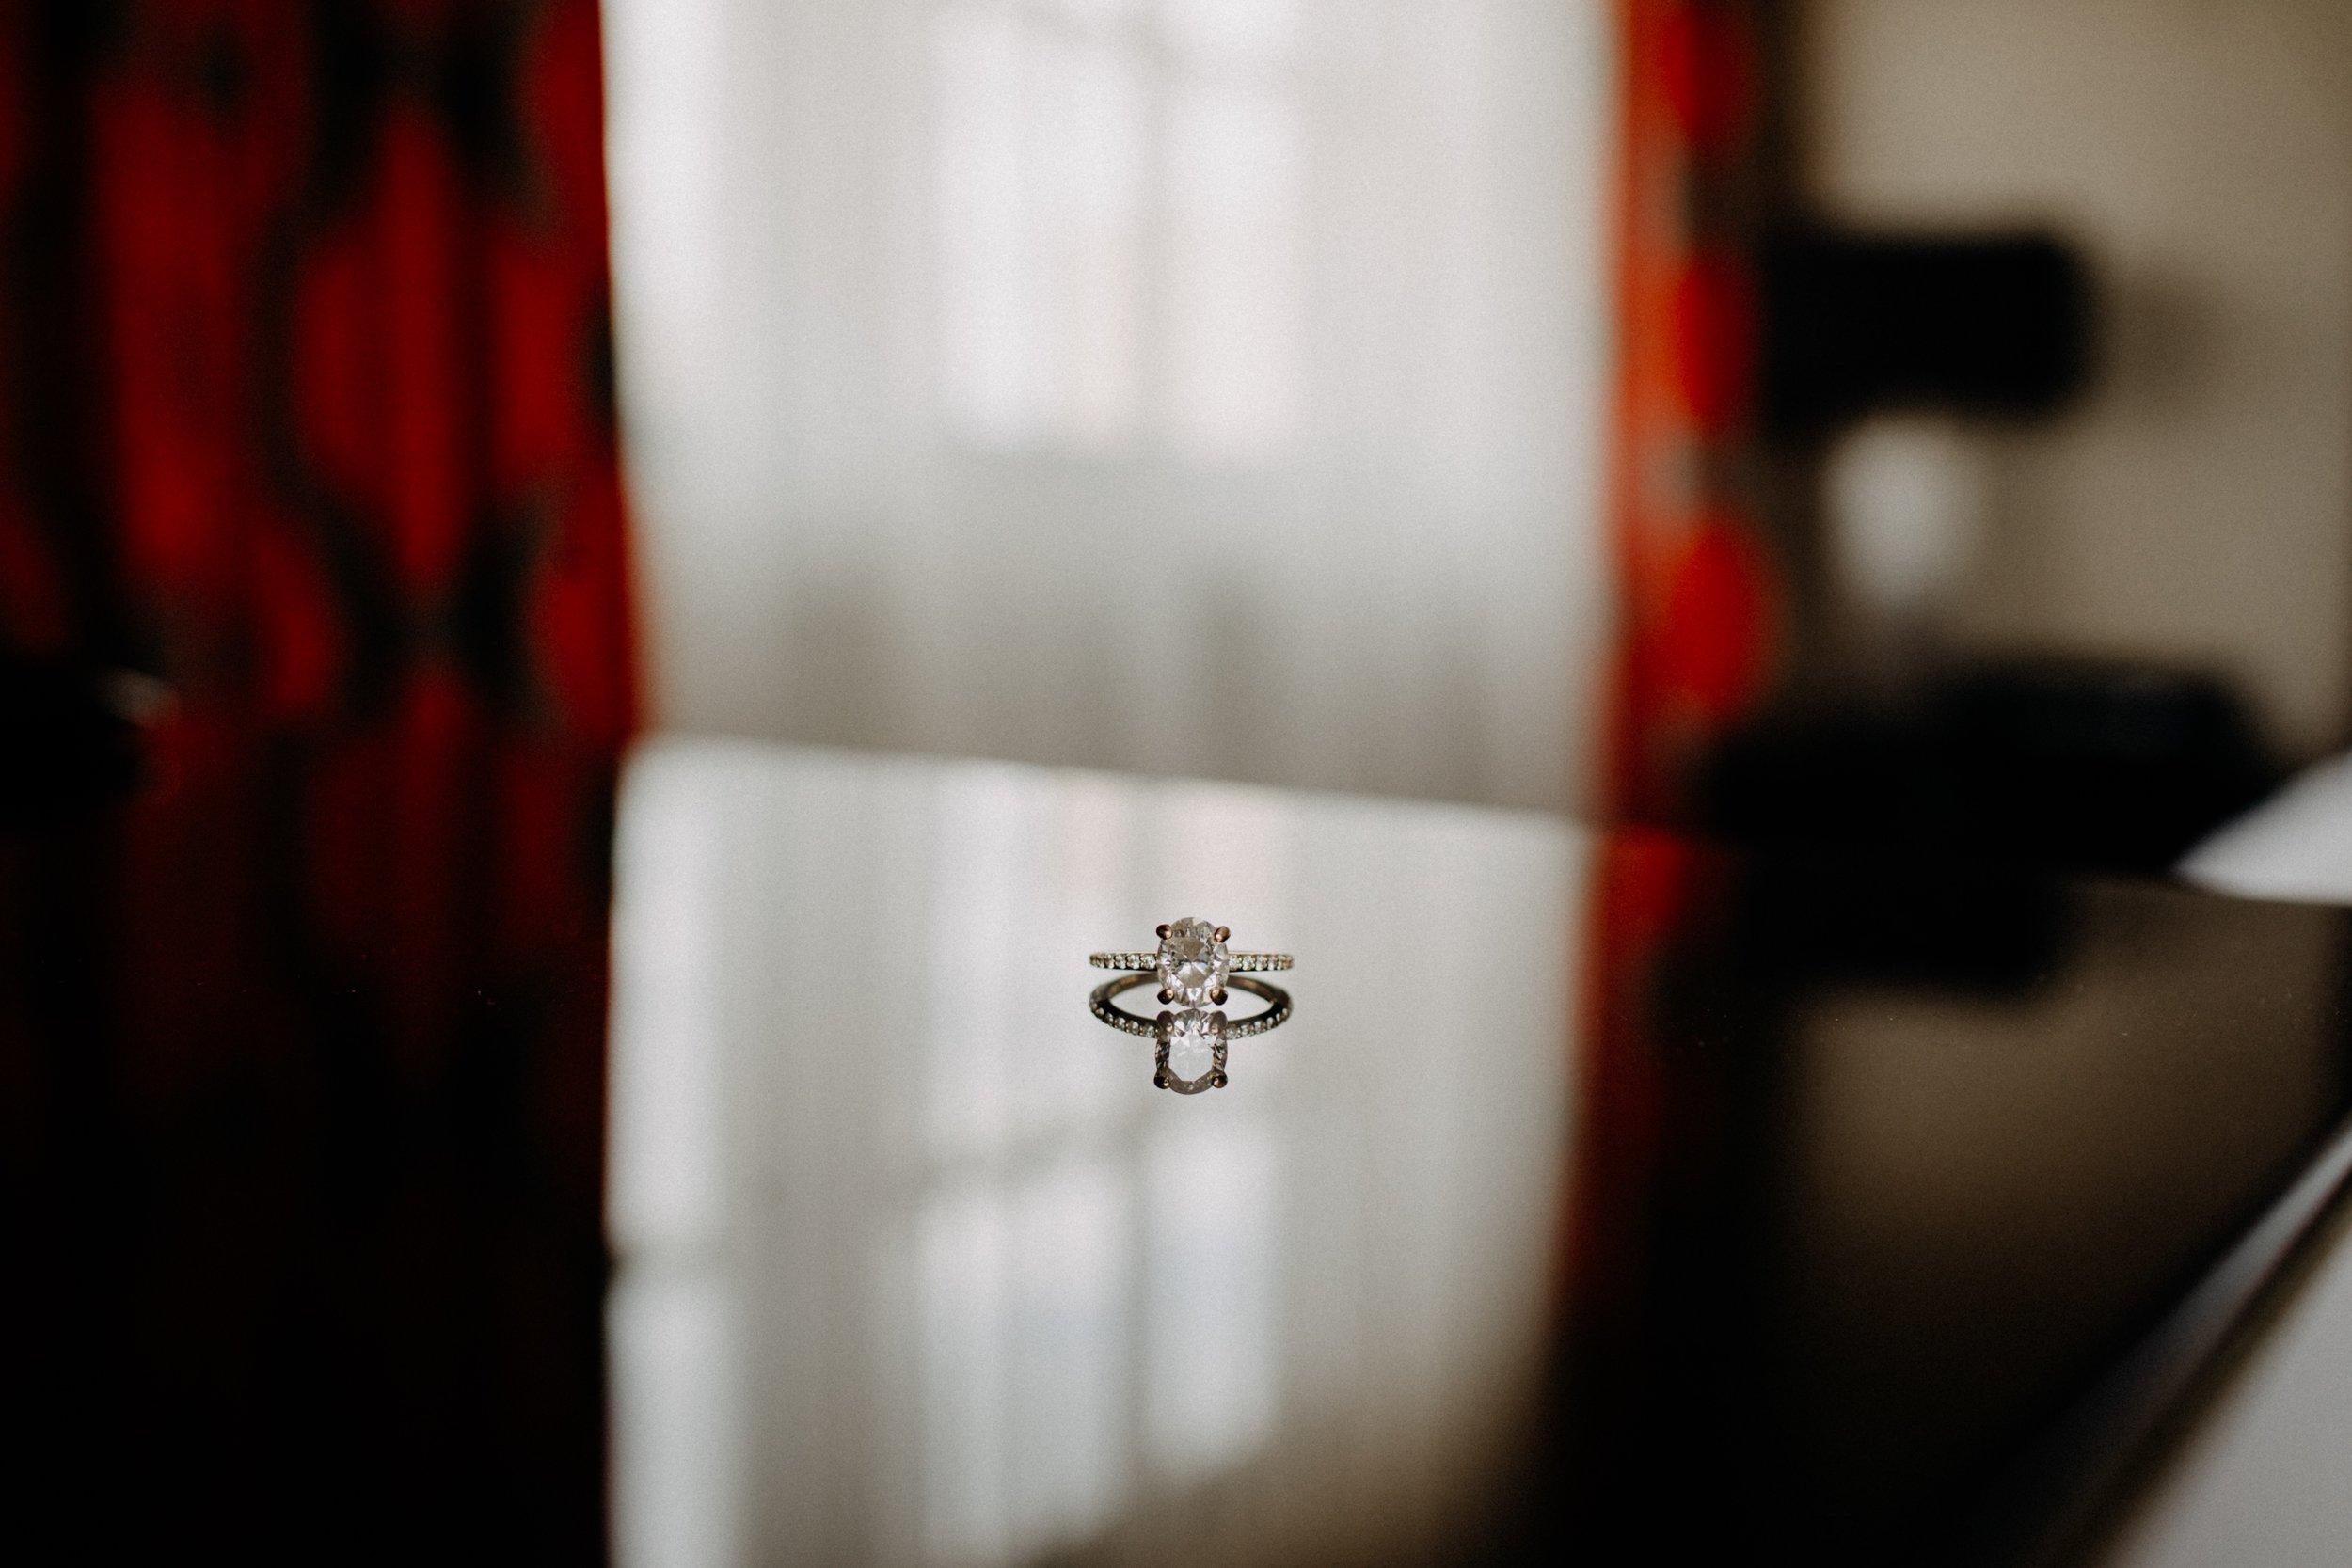 st-anthony-hotel-wedding-photography-10012san-antonio.JPG